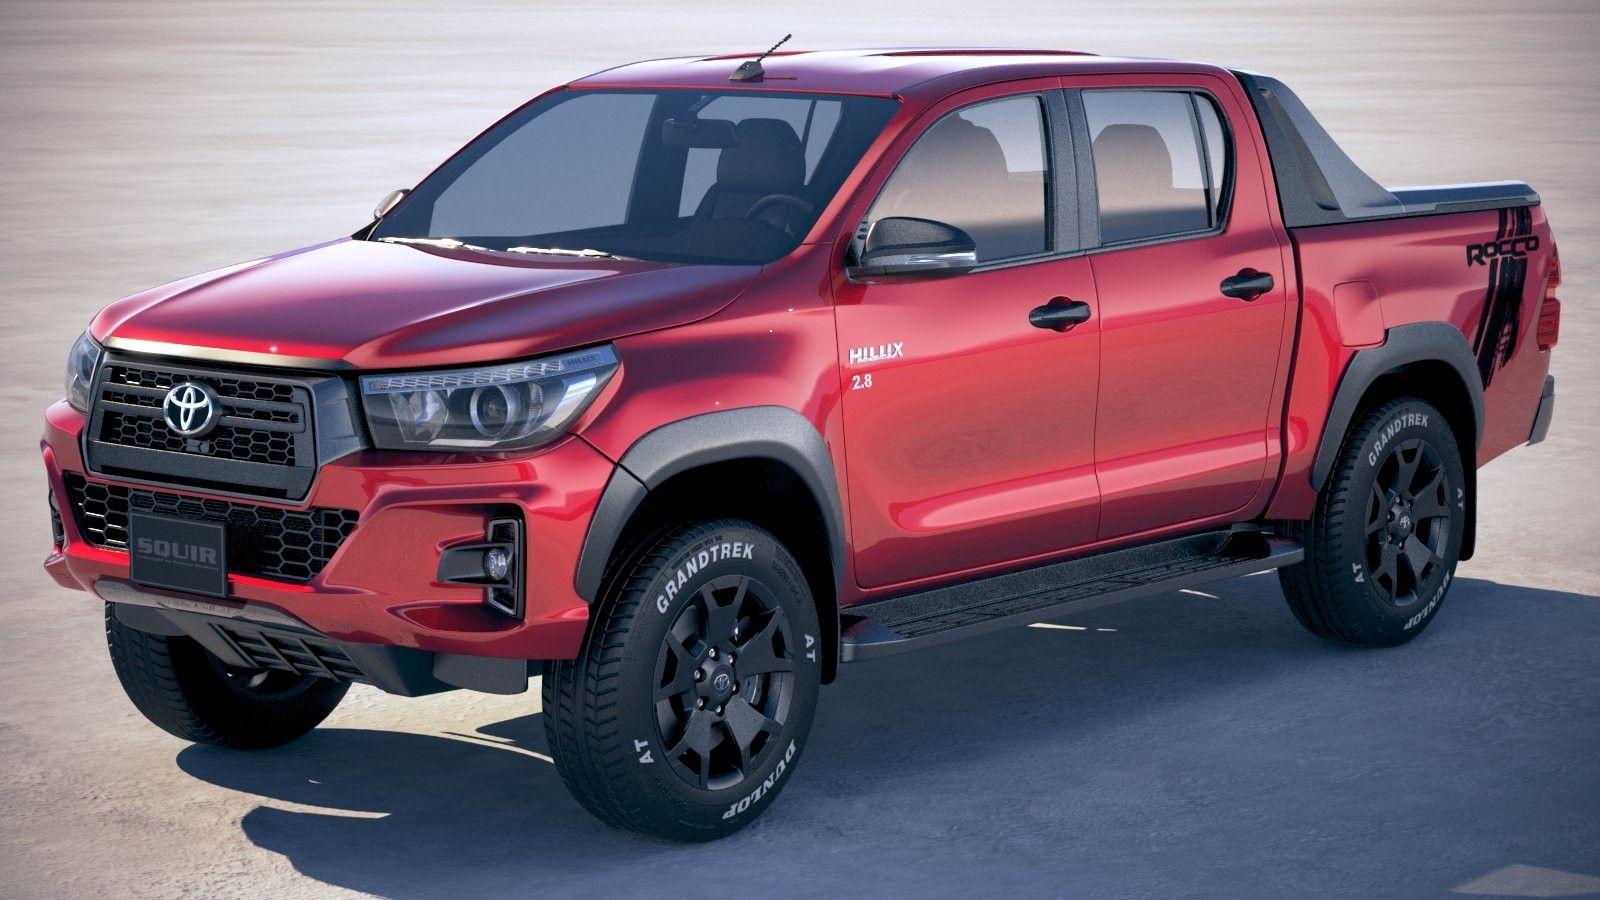 Kelebihan Harga Toyota Hilux 2019 Review